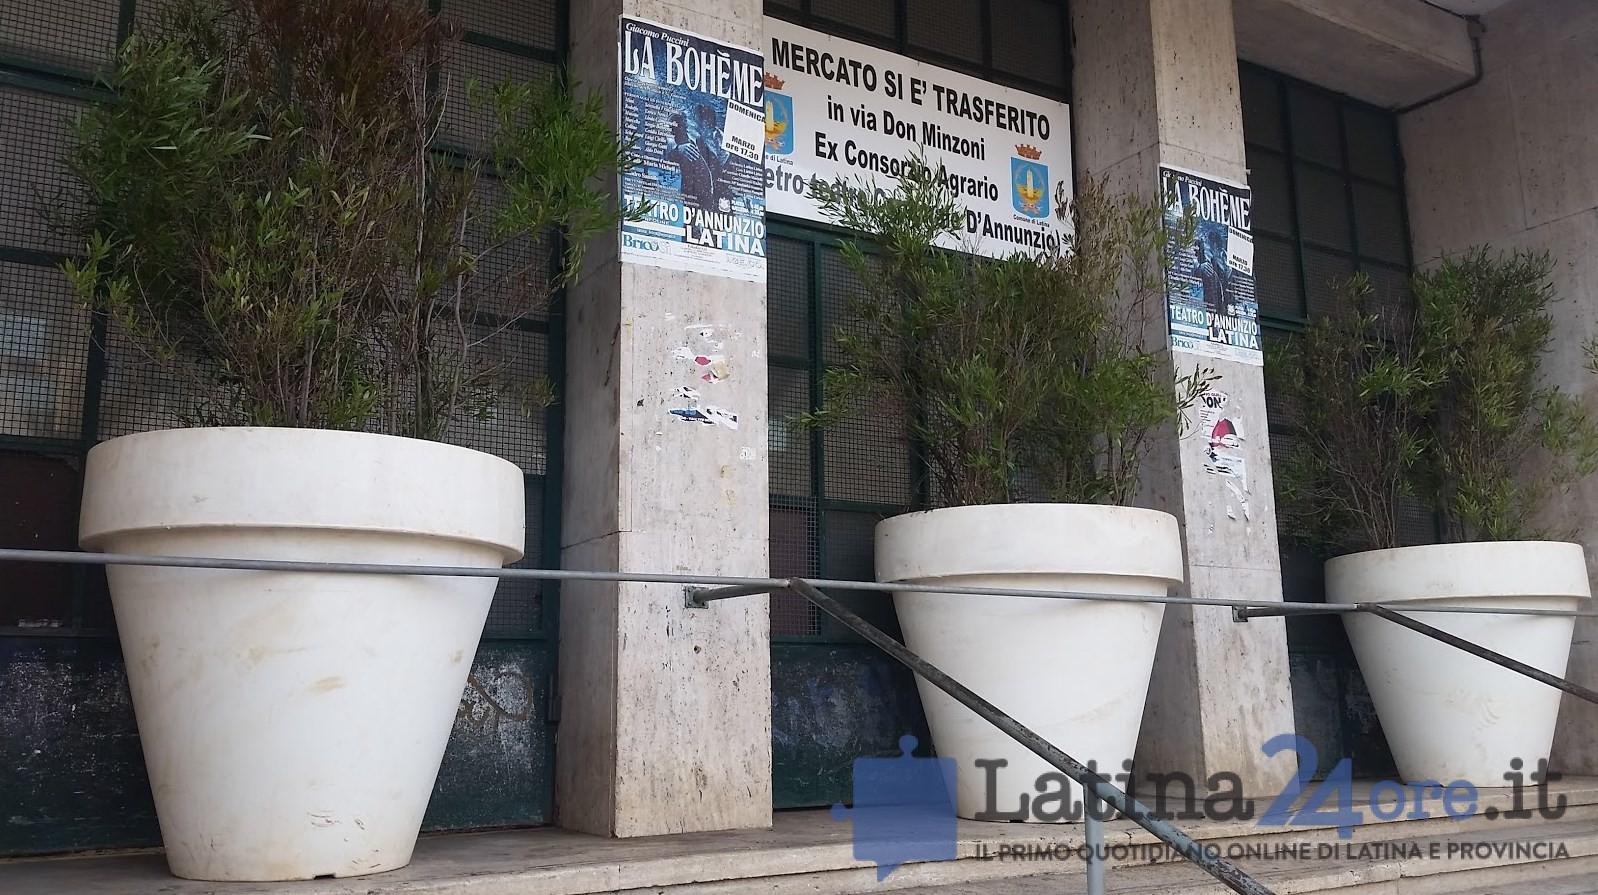 vasi-mercato-coperto-latina-clochard-2016